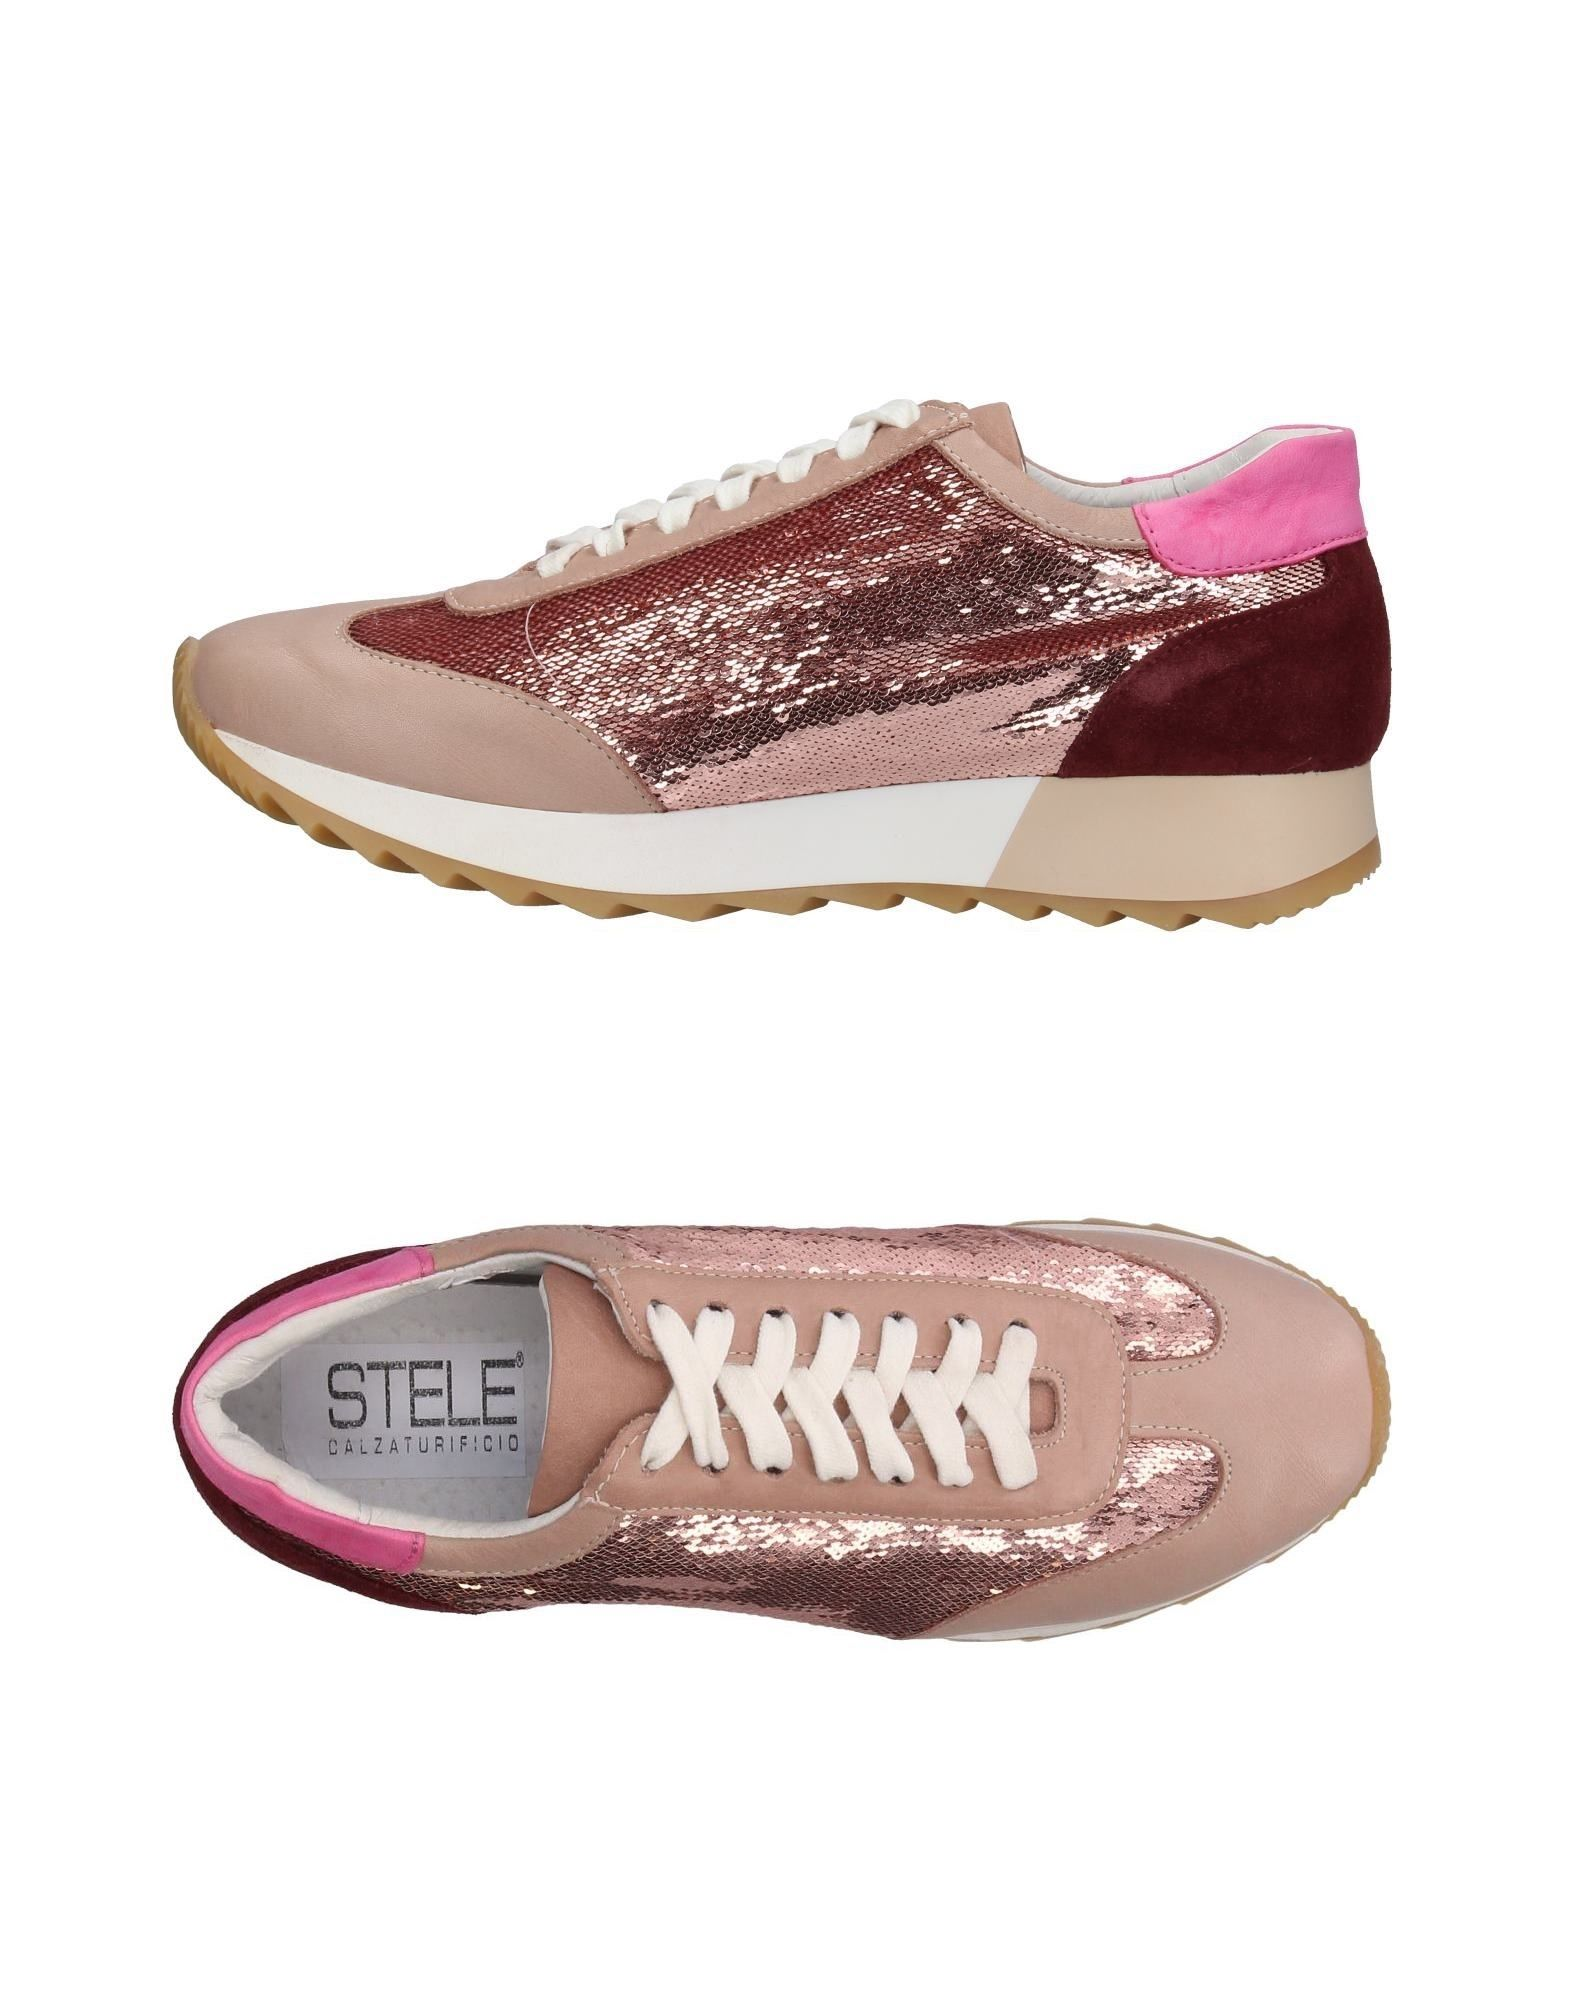 Stele Sneakers Damen  11375425UB Gute Qualität beliebte Schuhe